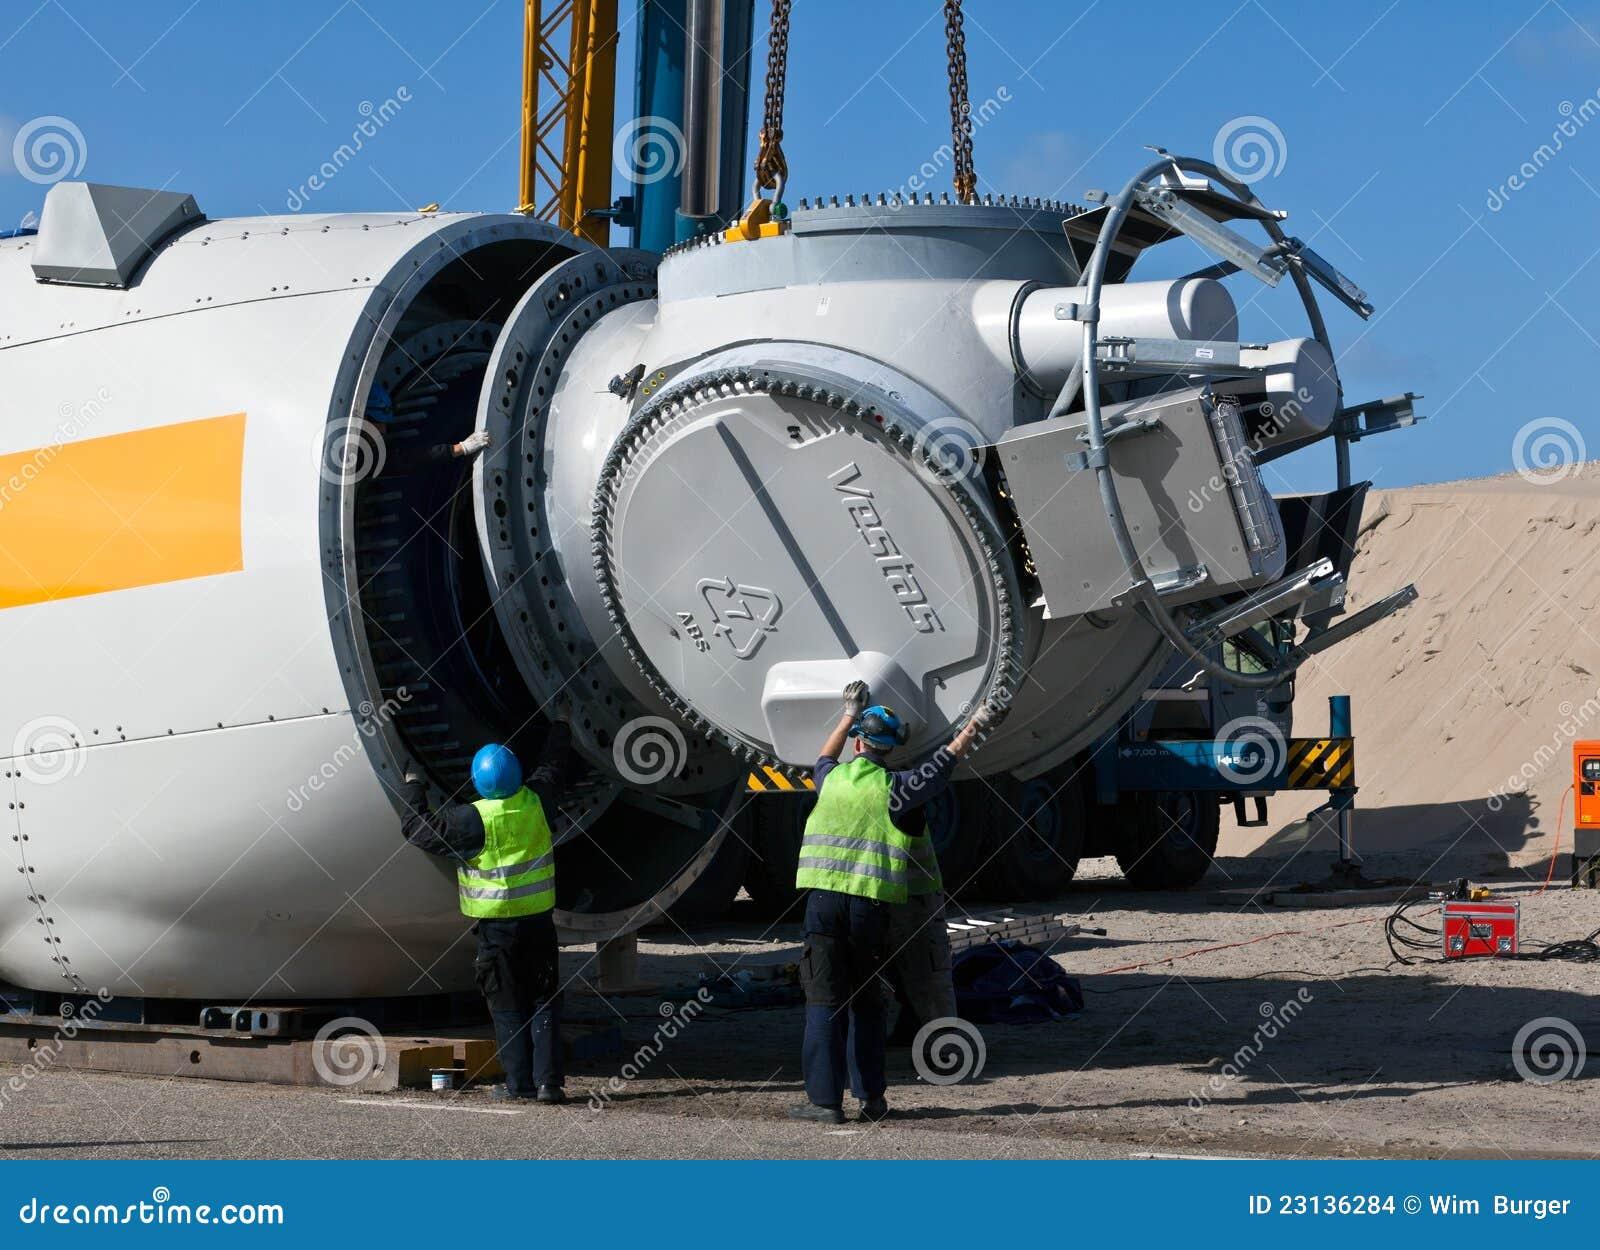 Wind Turbine Construction Site Editorial Stock Image - Image: 23136284